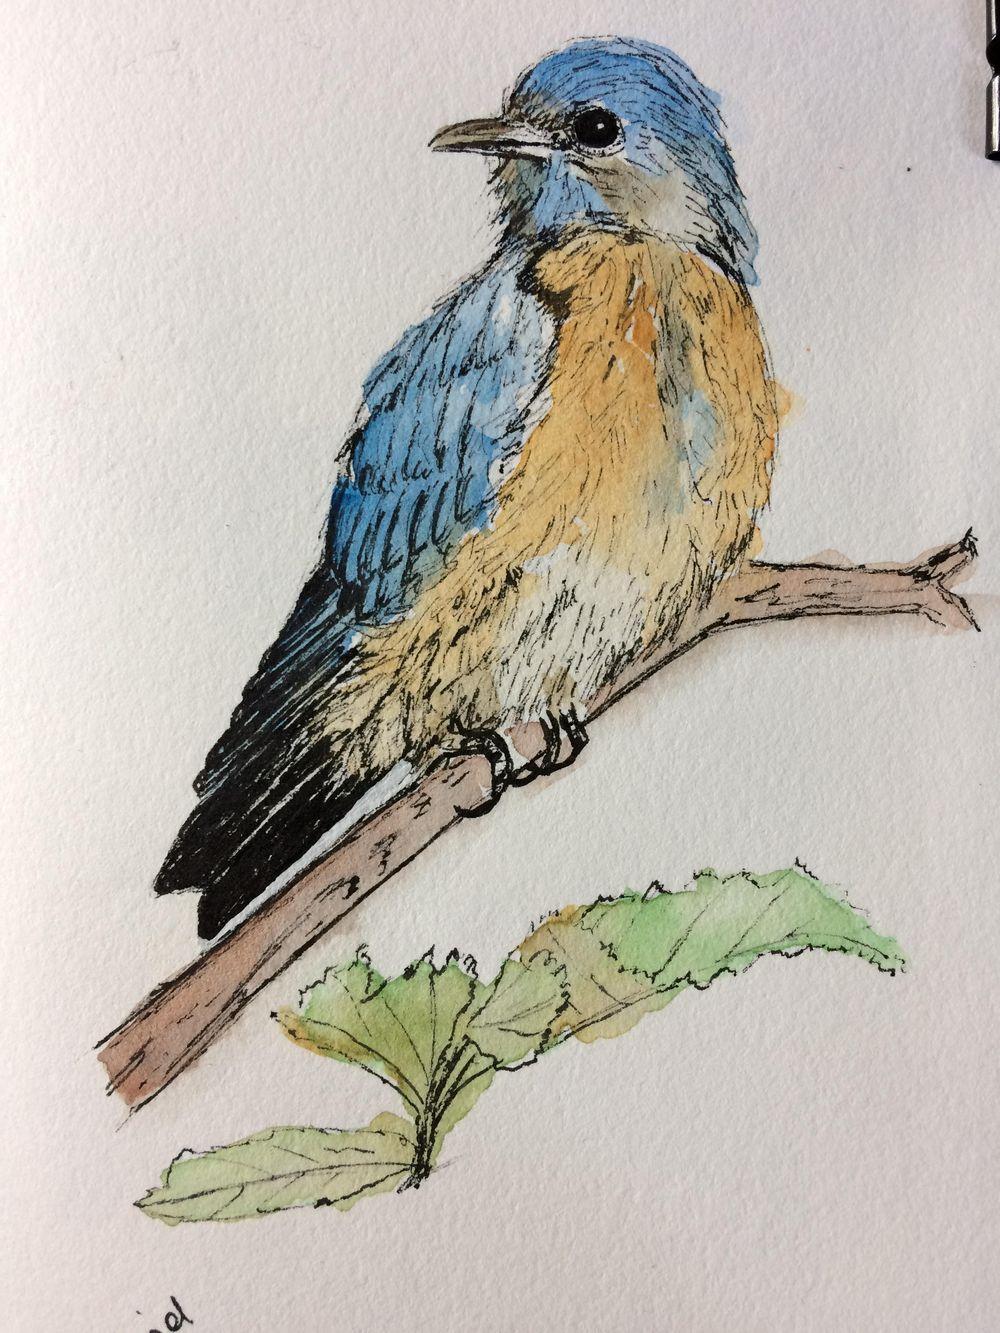 Bluebird - image 3 - student project